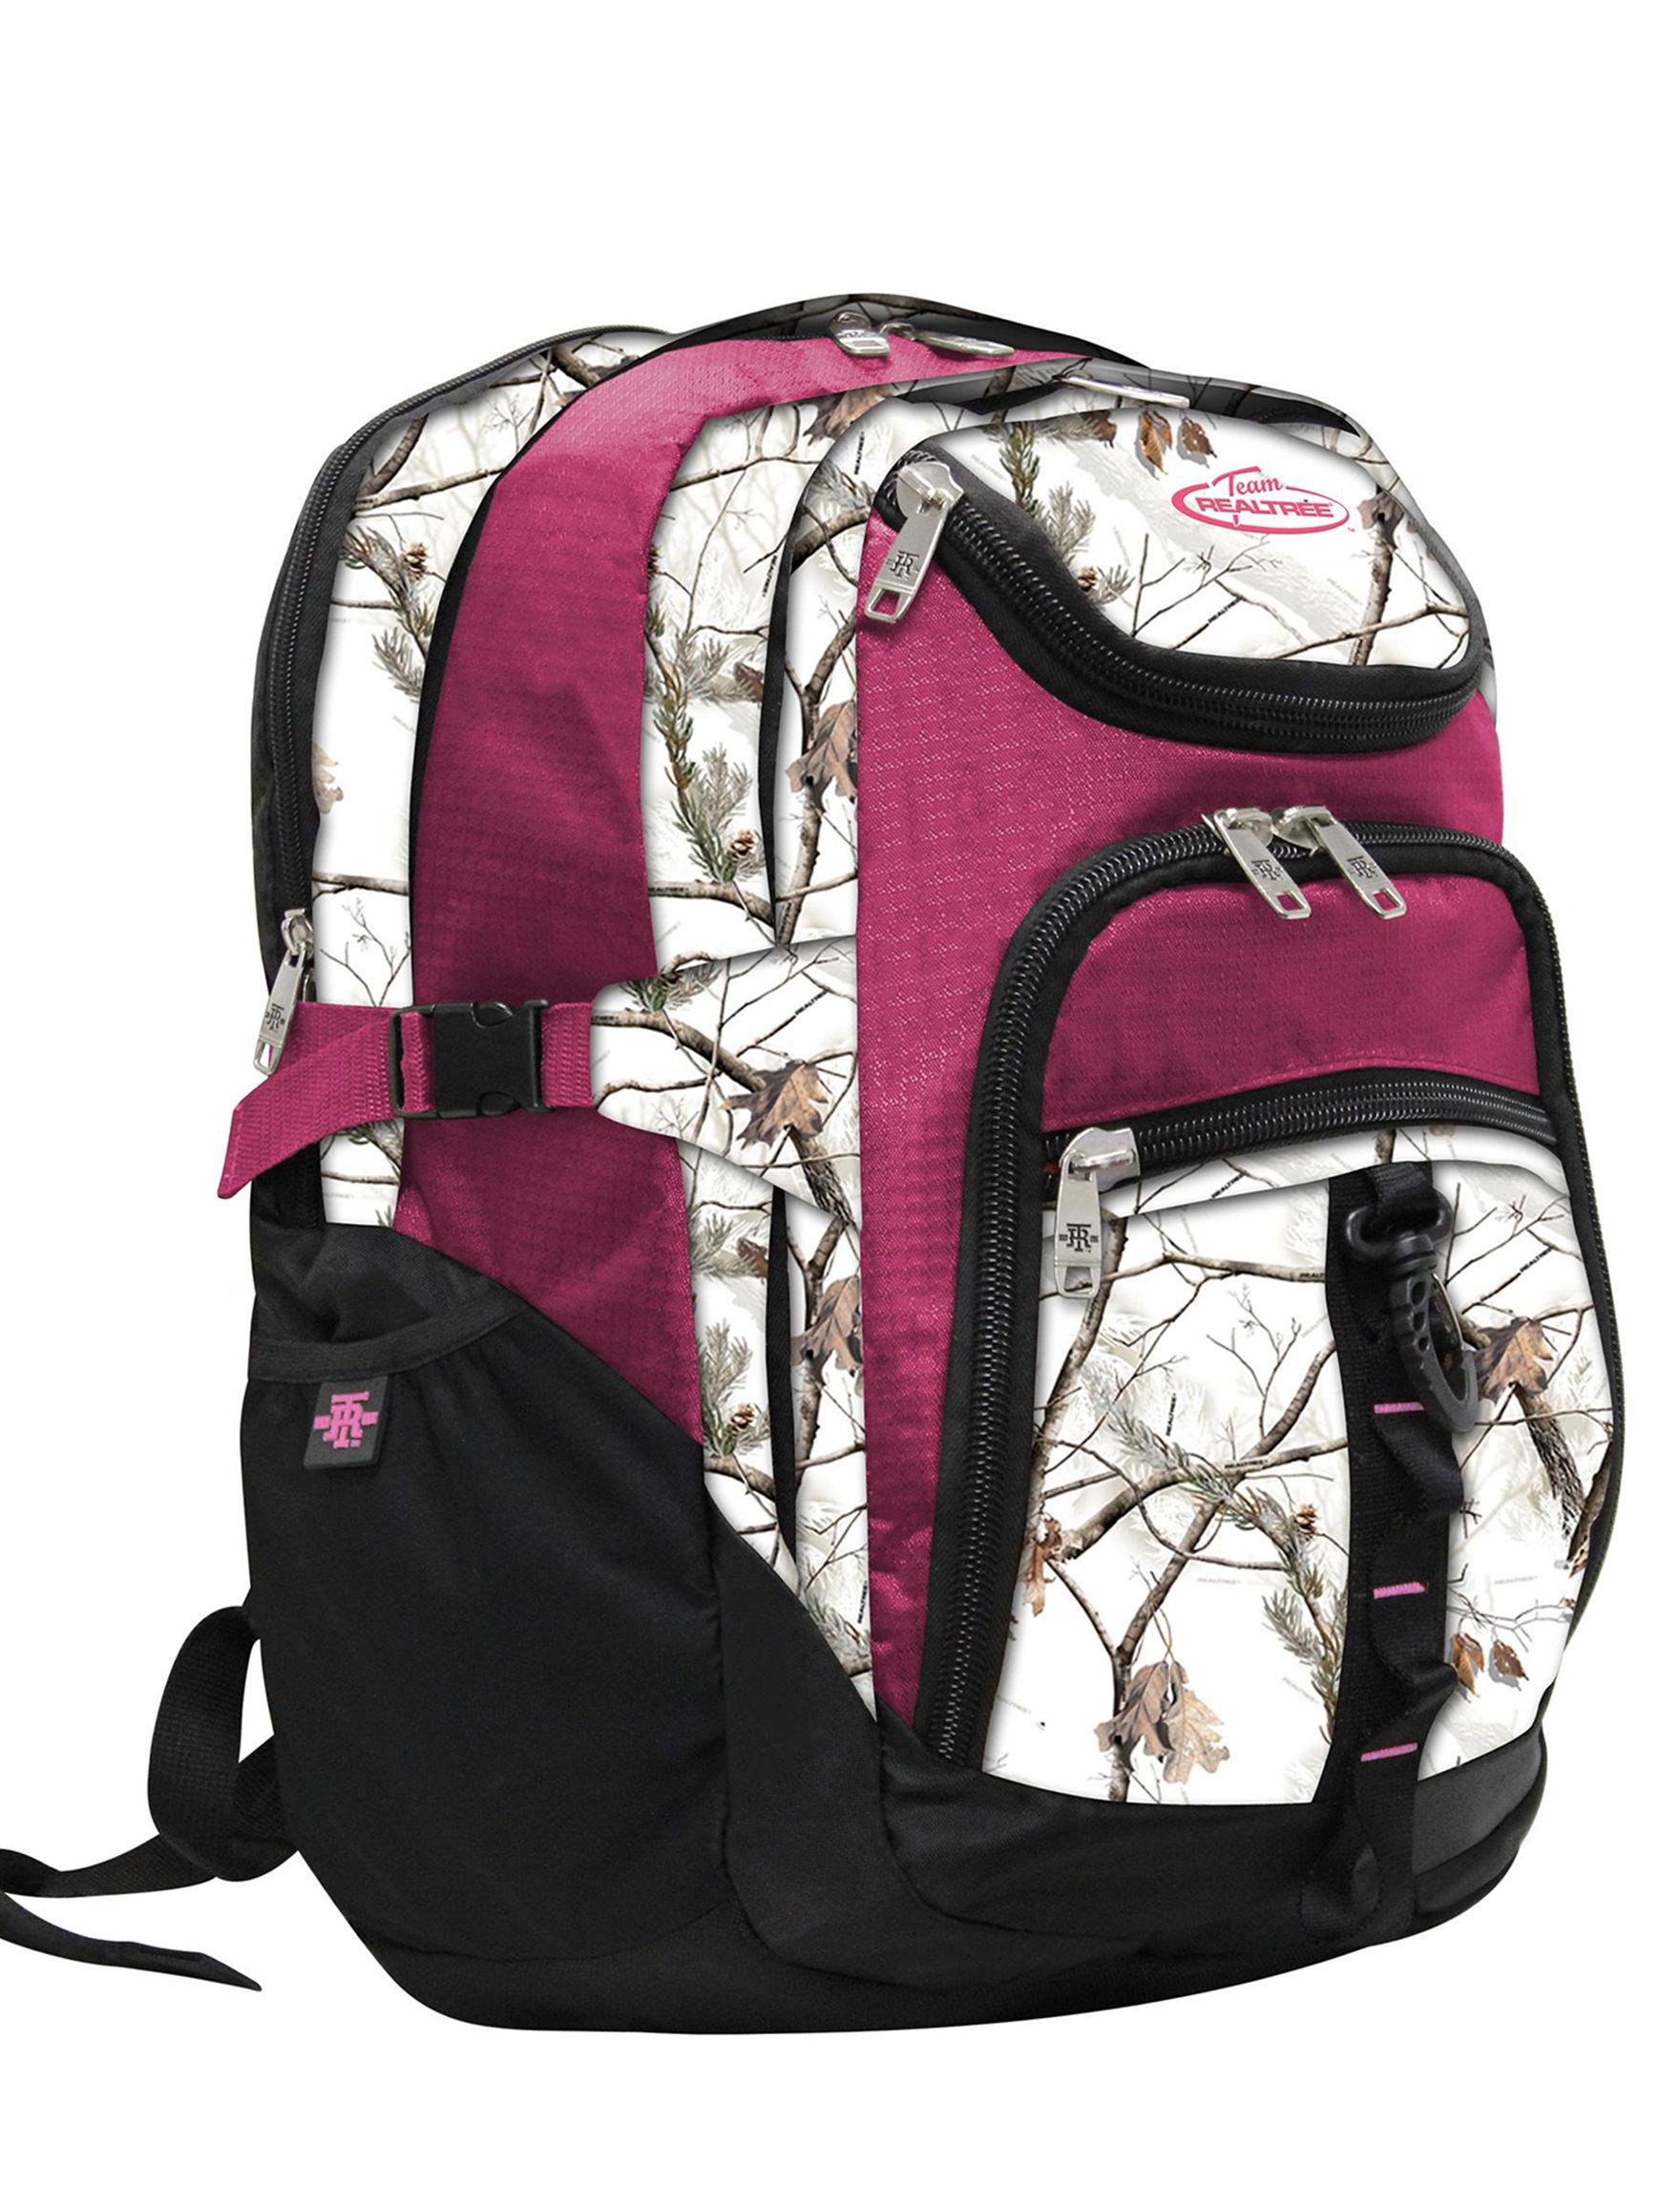 Realtree Raspberry Bookbags & Backpacks